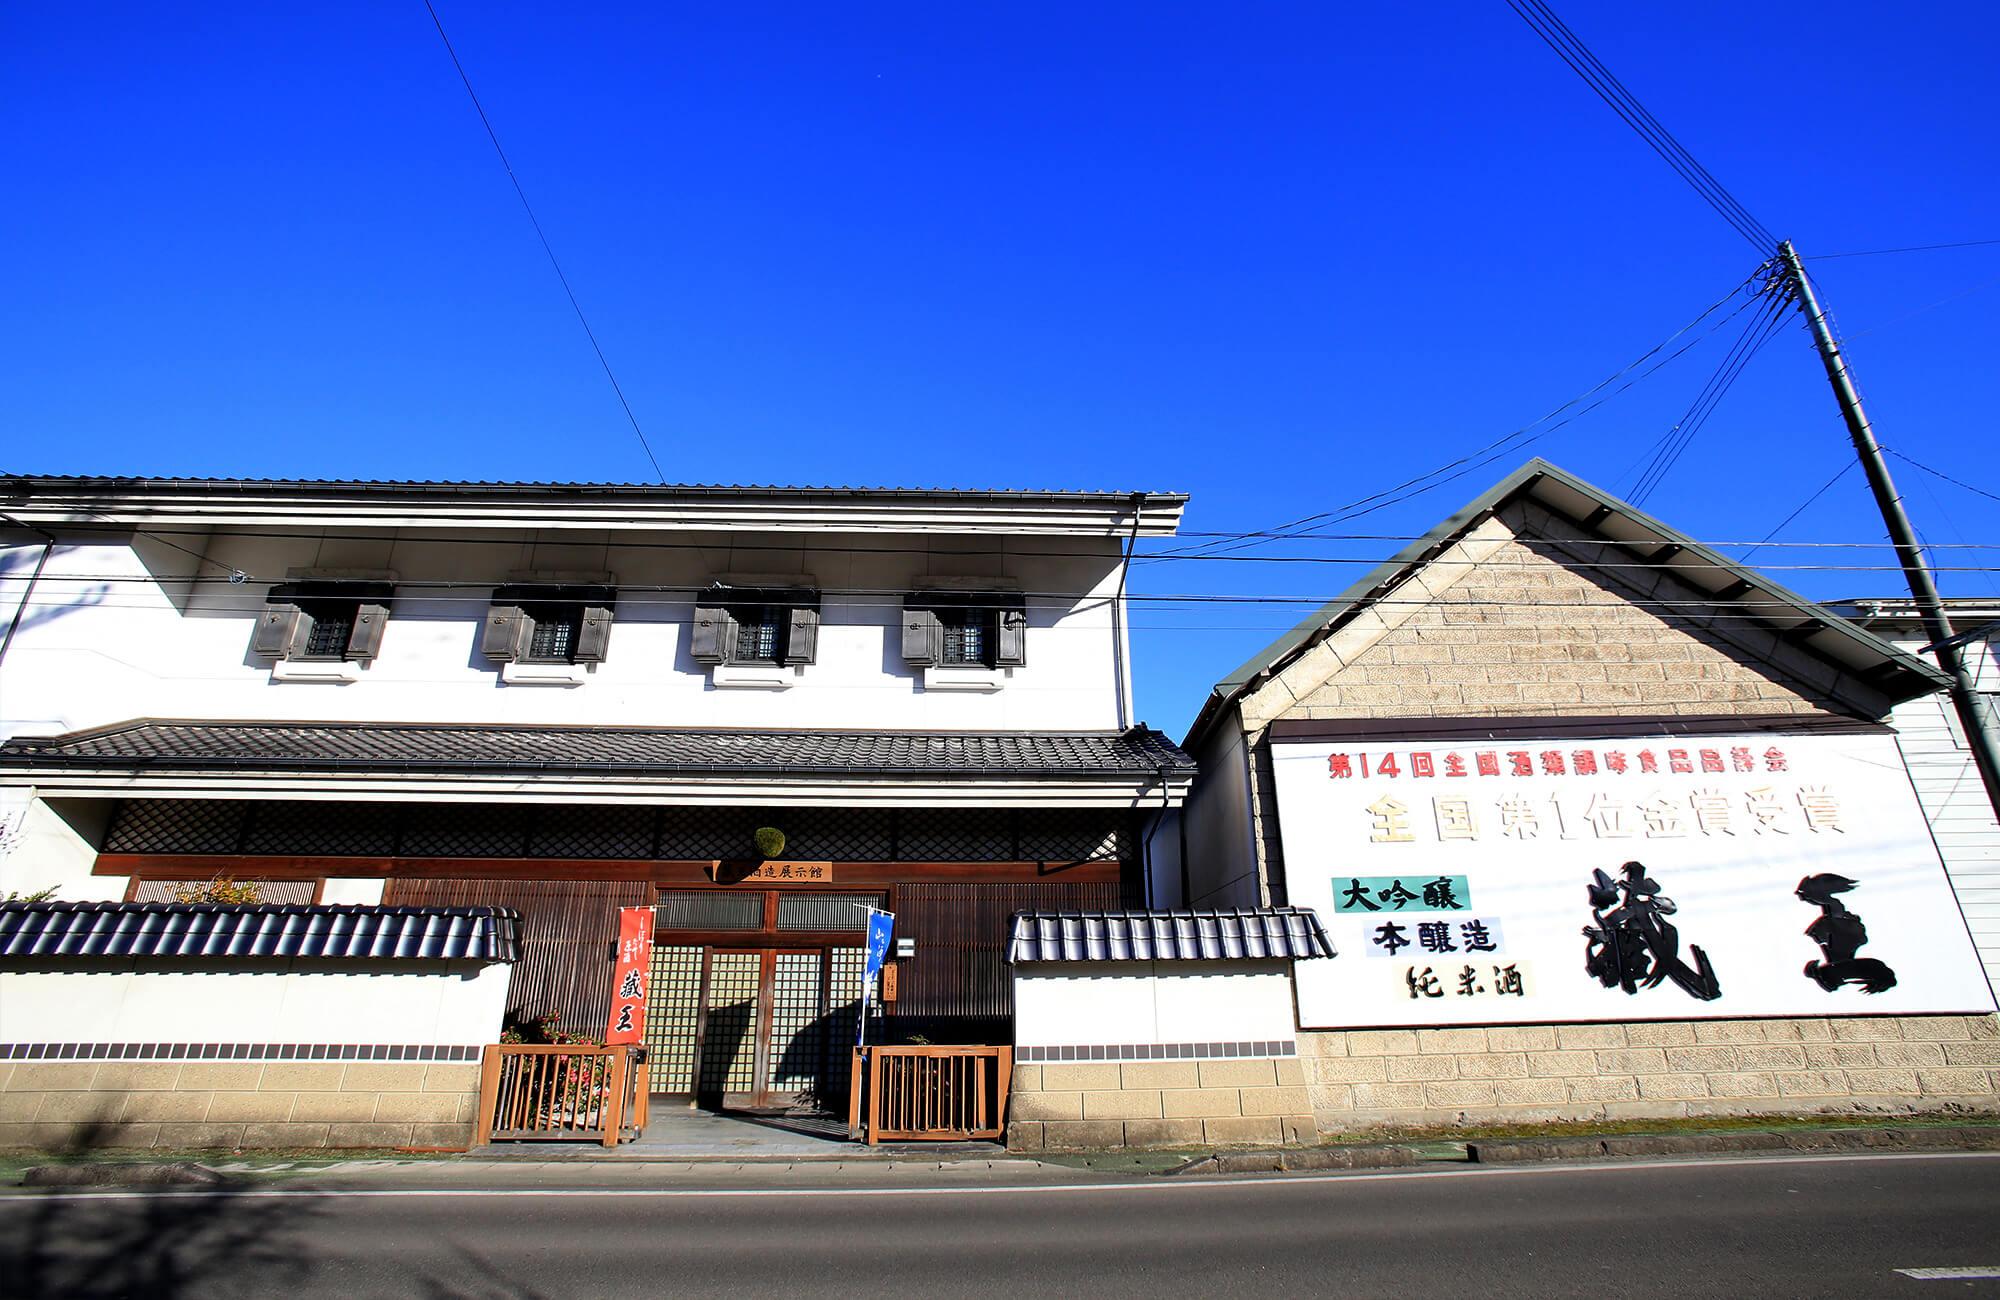 創業明治6年 白石の老舗酒造